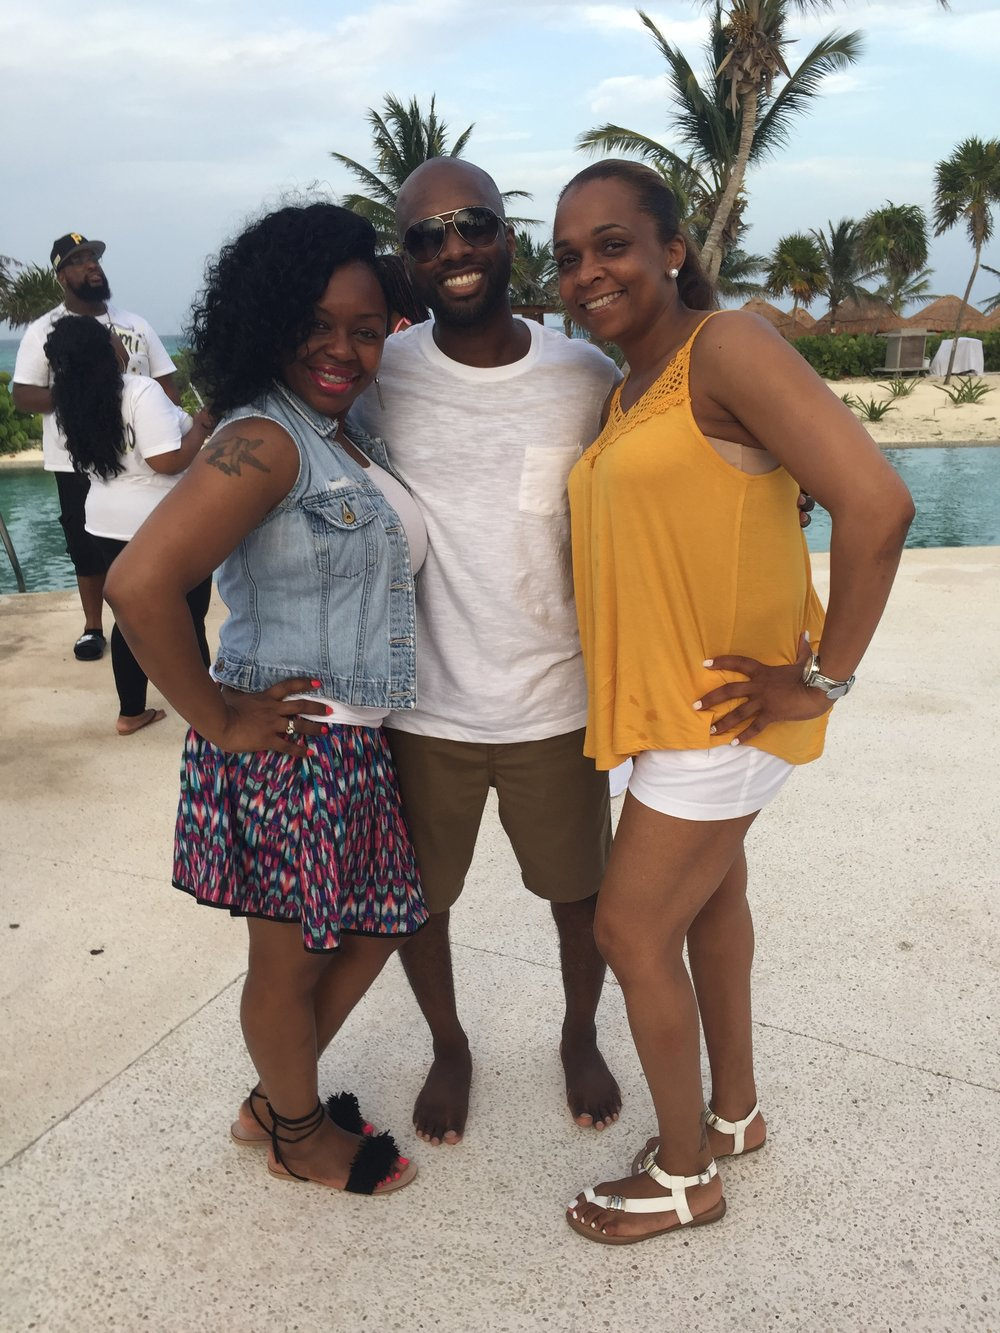 Black Destination Bride - BlackDesti Wedding Countdown Journal - Bridefriends Podcast - 3 Playa del Carmen Mexico - Secrets Maroma Welcome Pool7.JPG